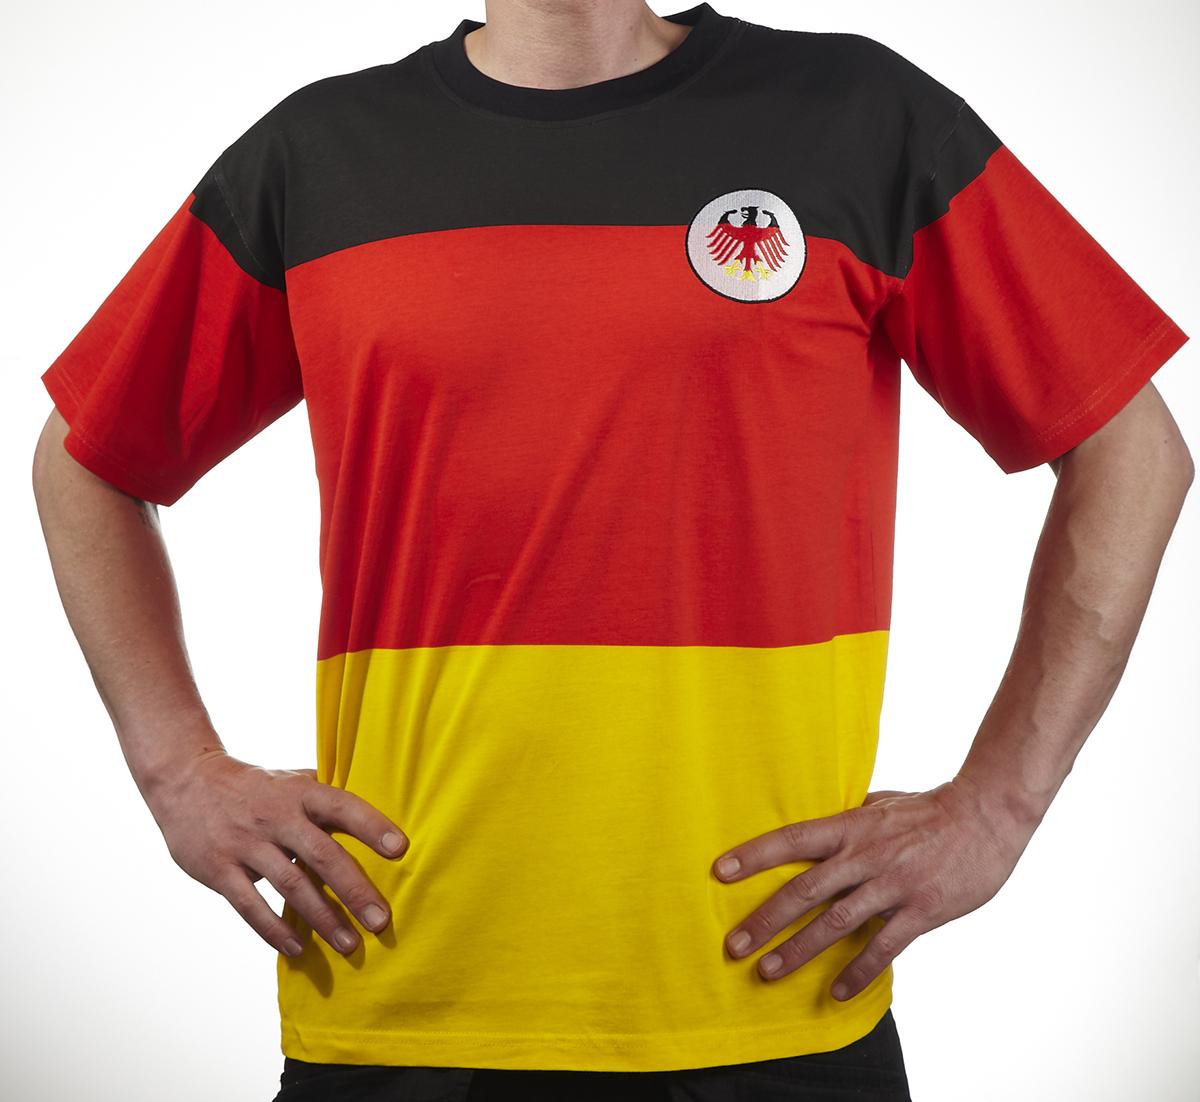 fanshirt deutschland flagge wm 2014 fan shirts bei berlindeluxe. Black Bedroom Furniture Sets. Home Design Ideas